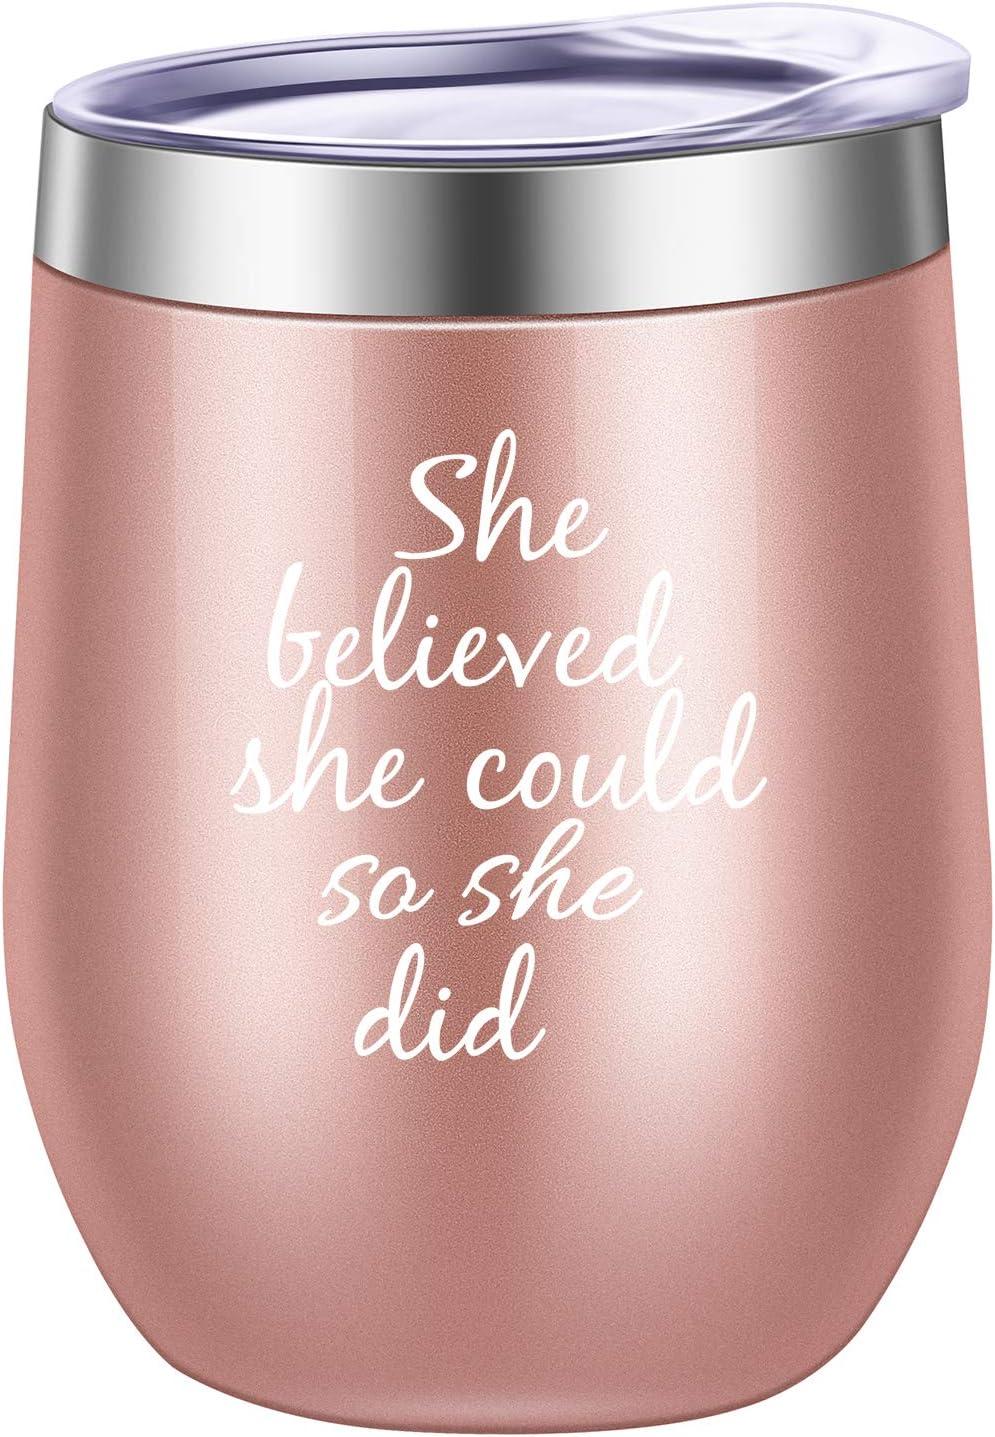 She Believed She Could So She Did Wine Tumbler Mug,Spiritual Inspiritional Gifts for Women,Congratulations, Graduation,Going Away,Job Change,Congrats,Birthday Gift 12 oz